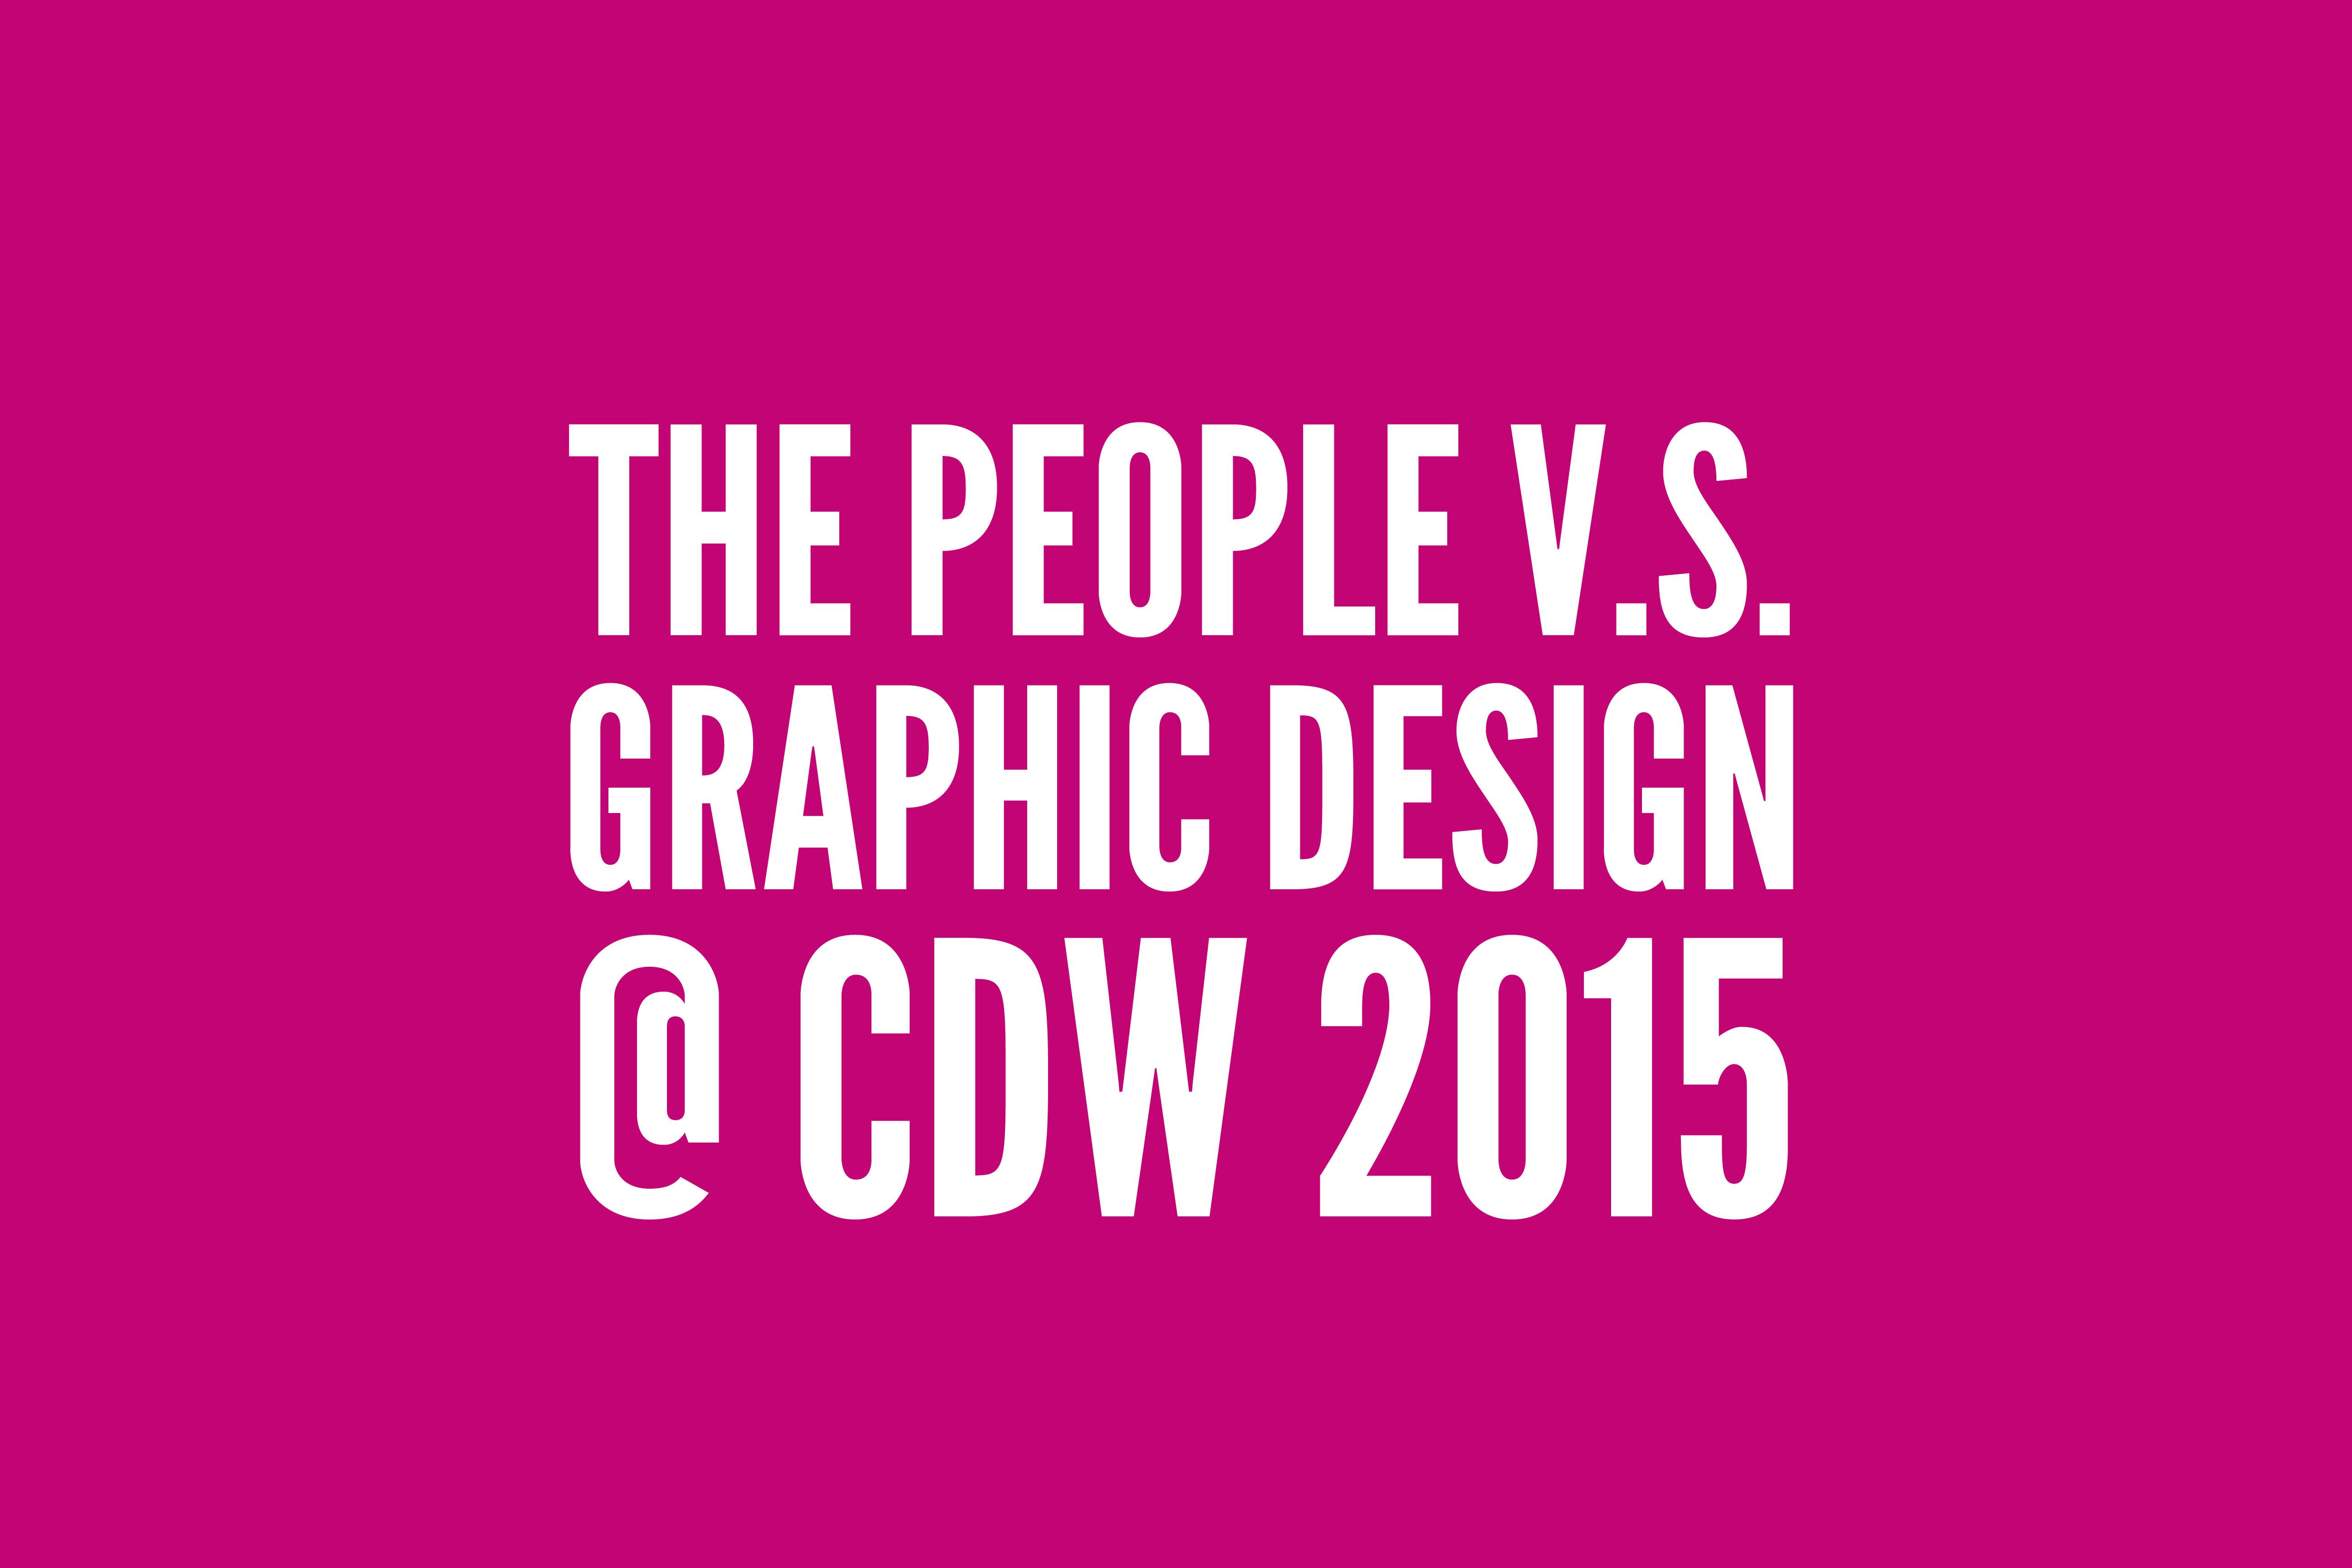 http://graphiquefantastique.com/wp-content/uploads/2015/05/ThePeopleVSGraphicDesign.jpg